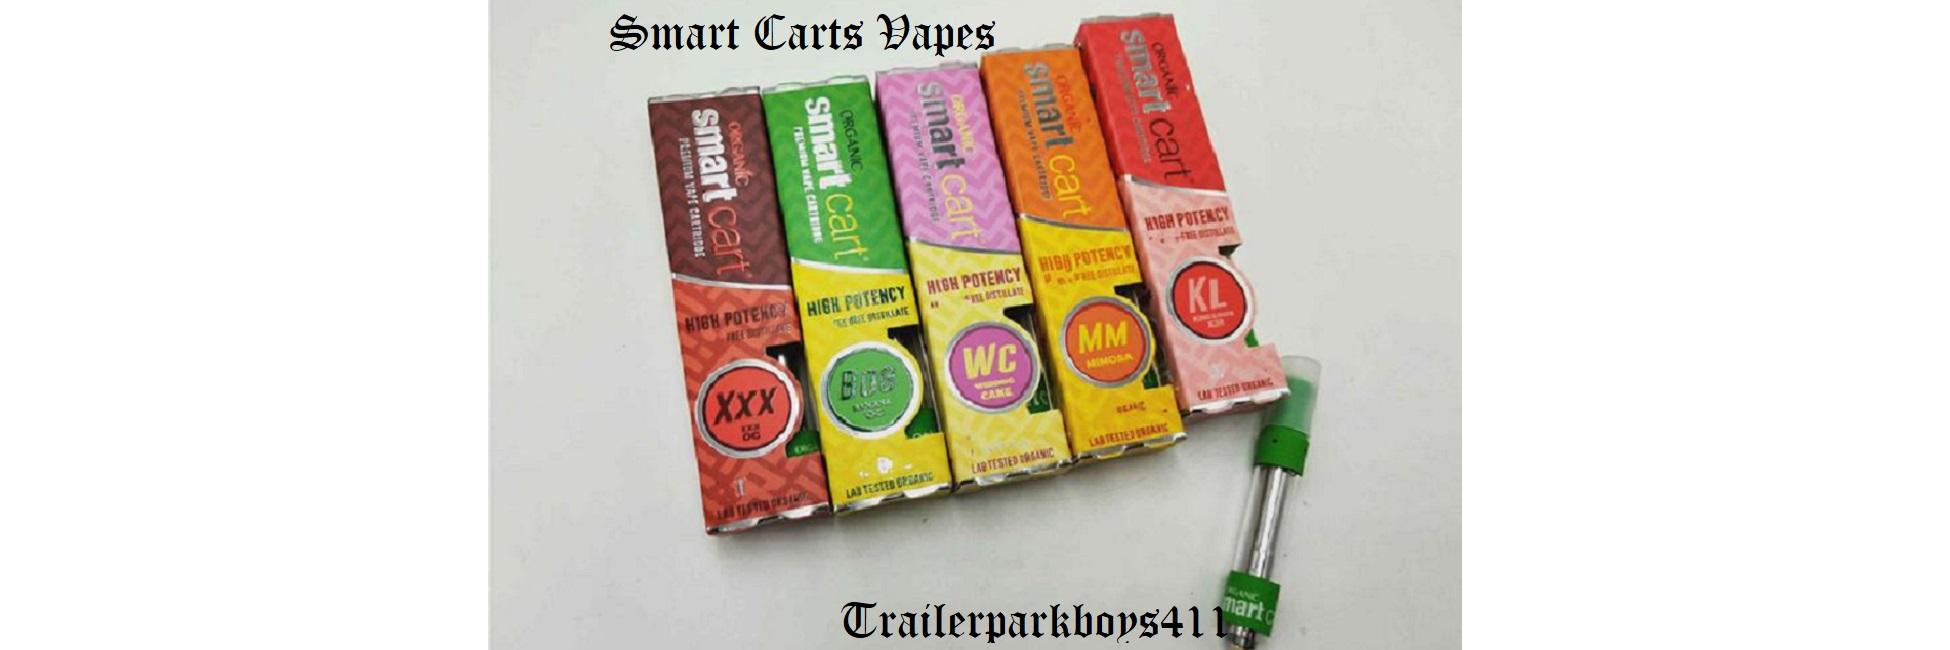 Smart Carts Vapes